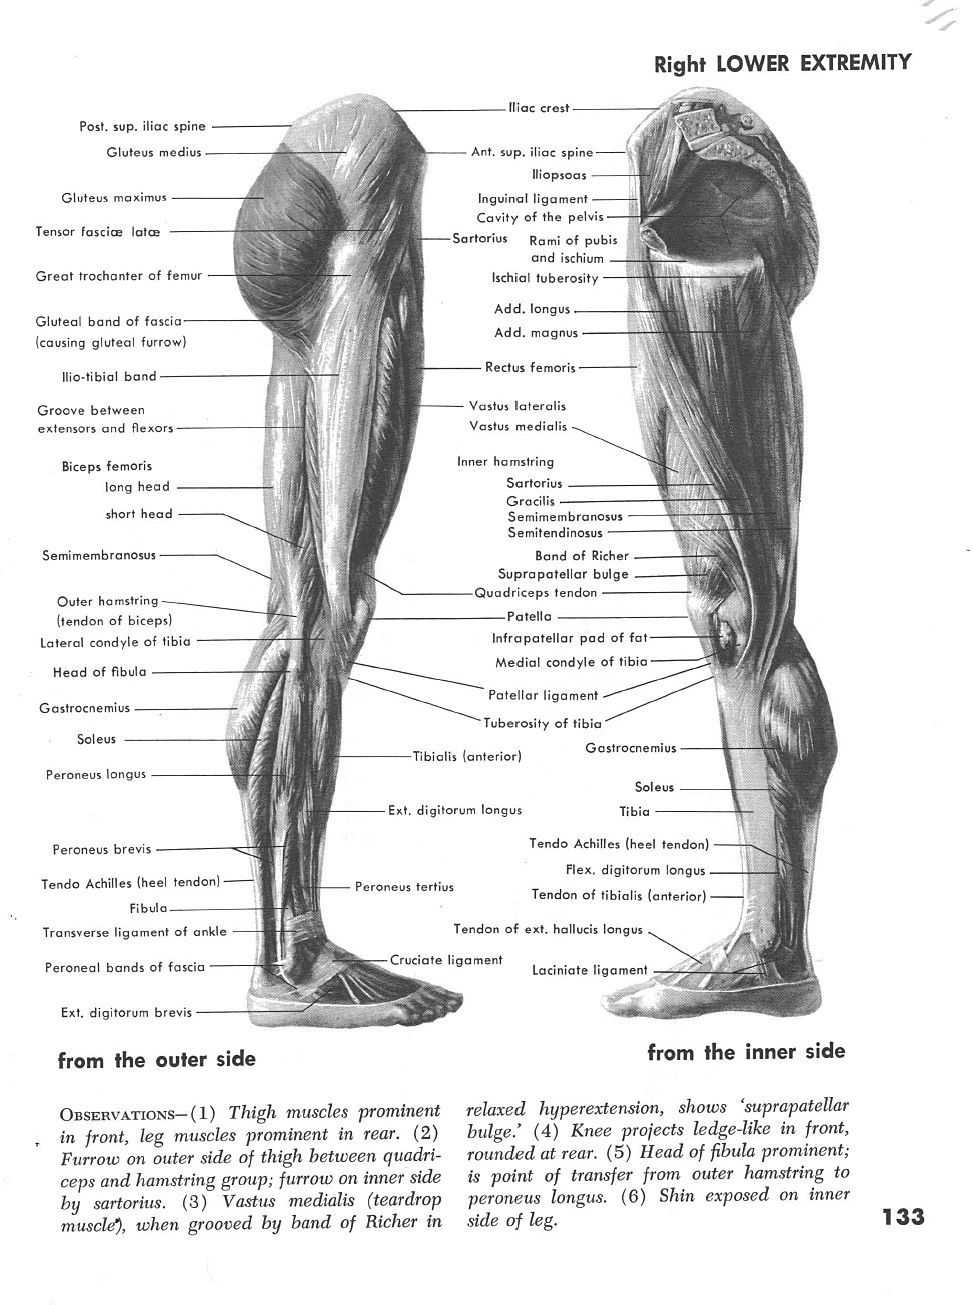 Right Leg Profile Muscles Both Sides Anatomy Pinterest Anatomy